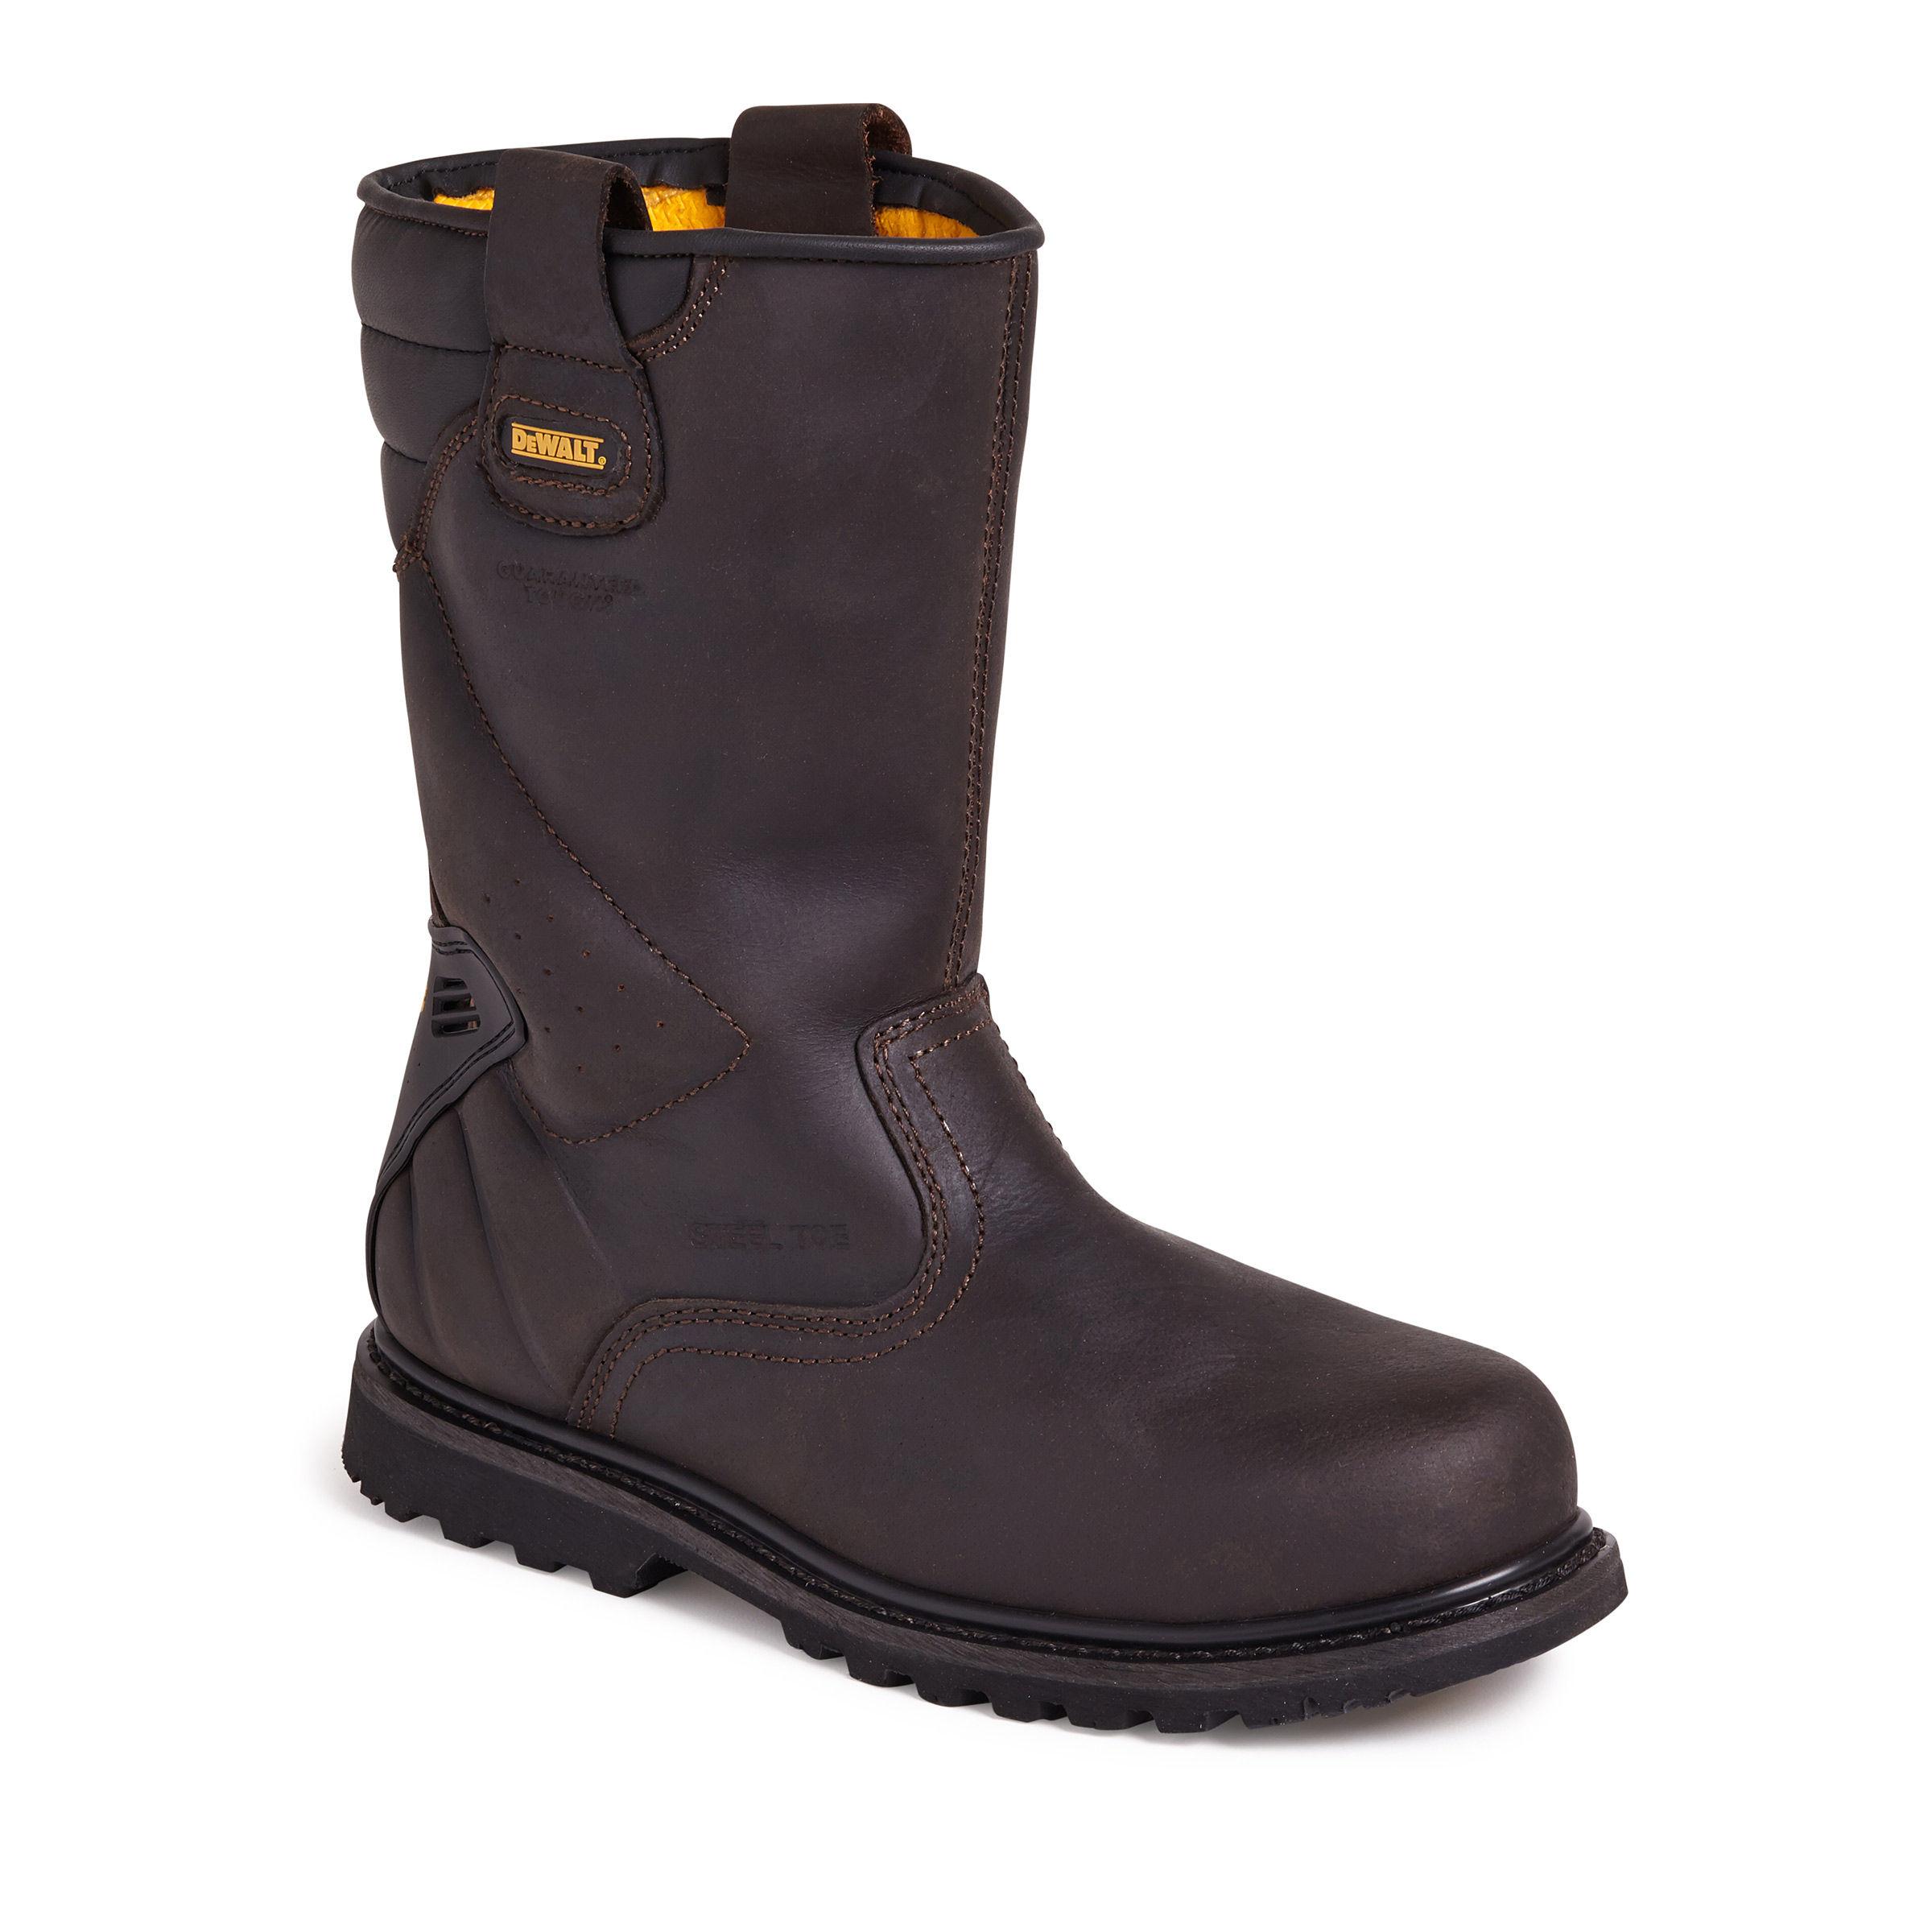 197d7c32933f71 Dewalt Dewalt Tungsten Waterproof Rigger Safety Boot 200 Joule Toecap in  Brown - Size 9 @20361